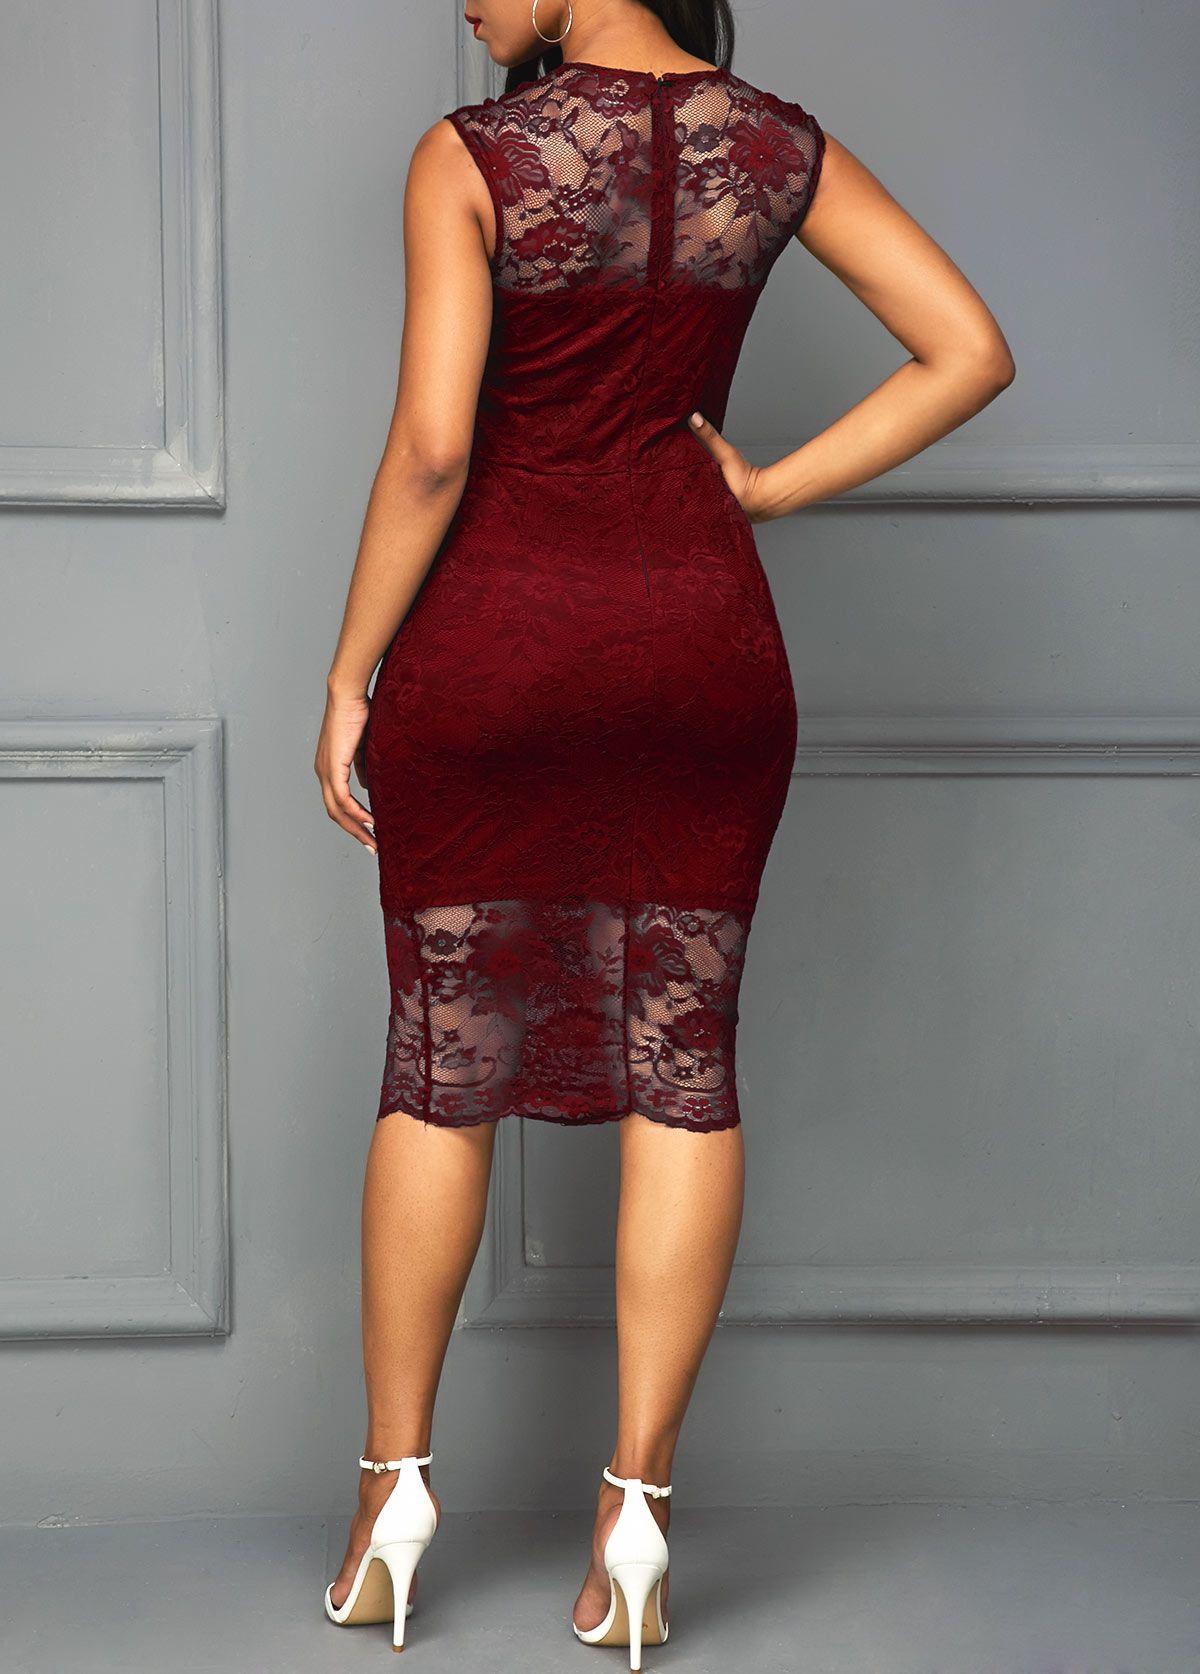 Scalloped Hem Round Neck Wine Red Sleeveless Dress Rosewe Com Usd 36 63 Classy Dress Outfits Midi Dress Sleeveless Lace Dress Styles